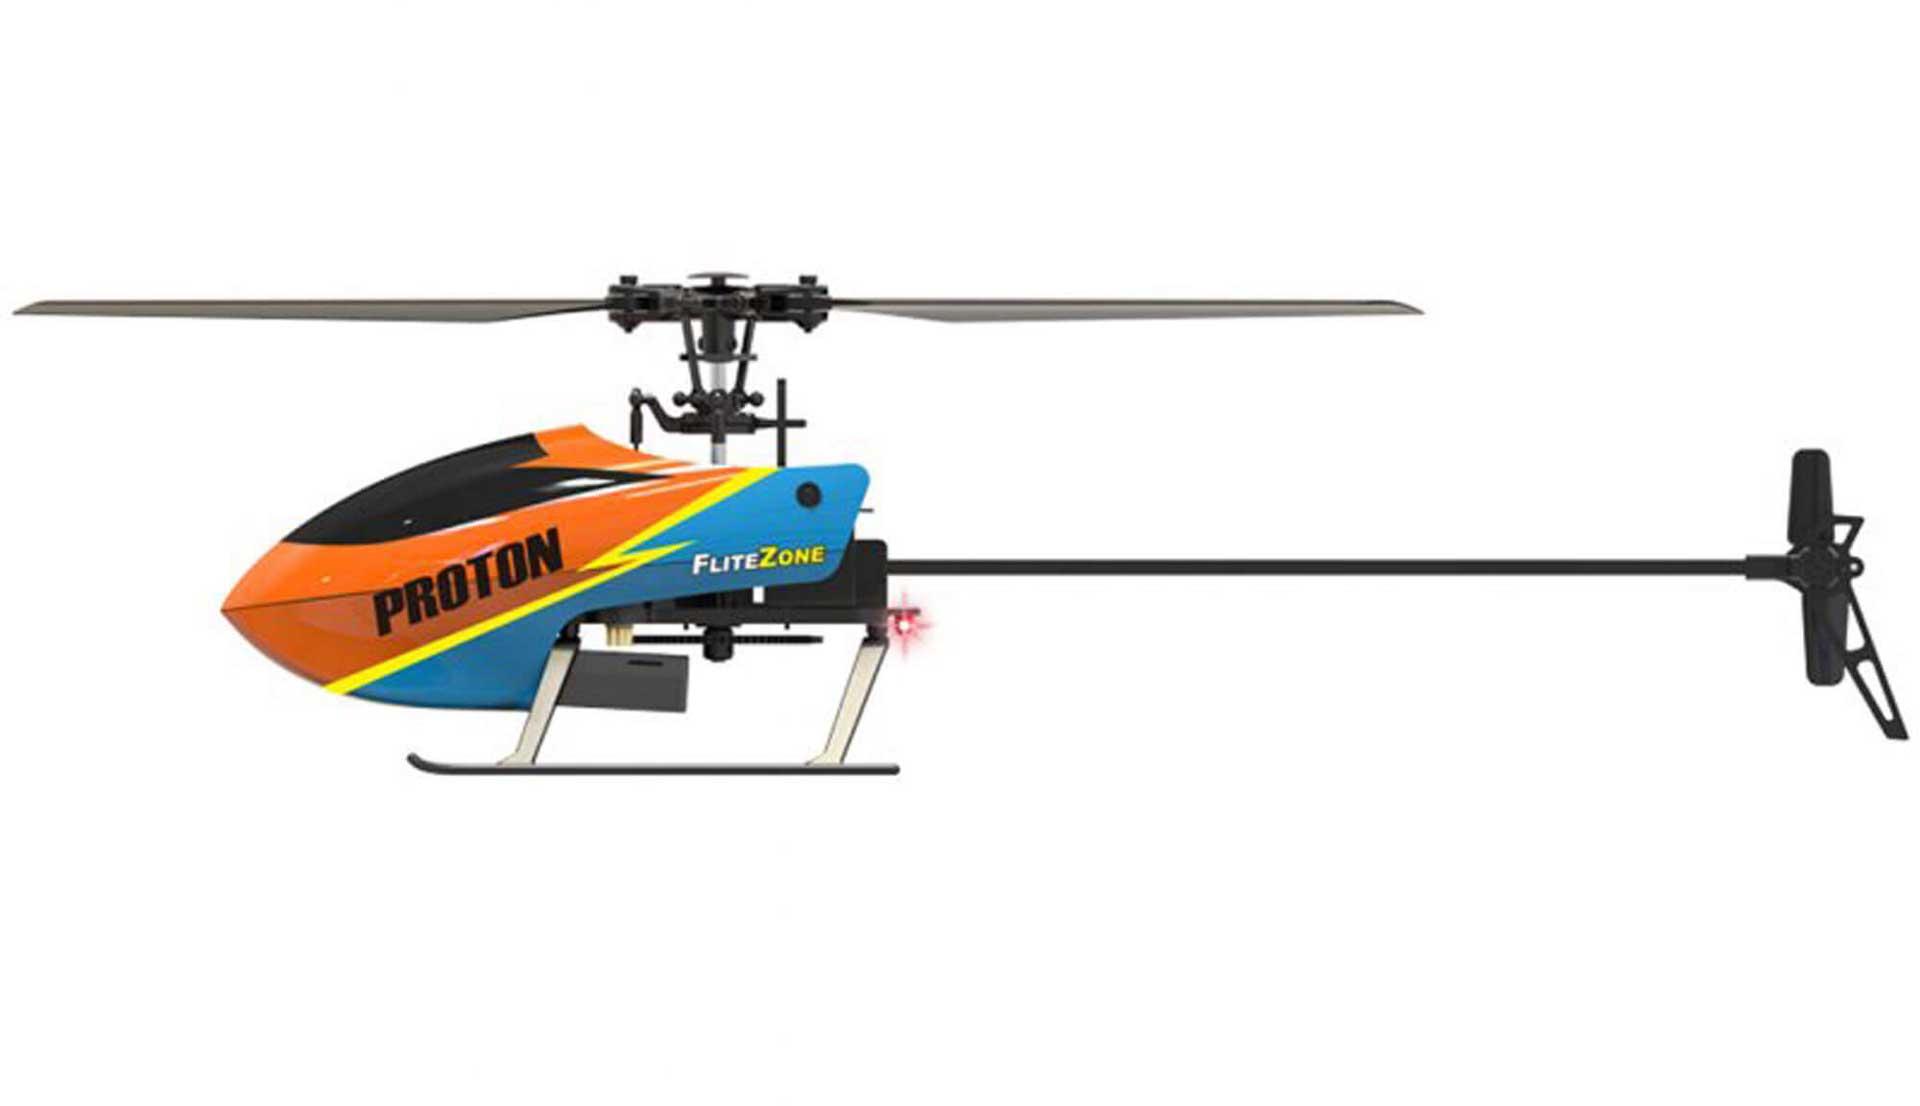 PICHLER Helicopter Proton RTF 2,4GHz